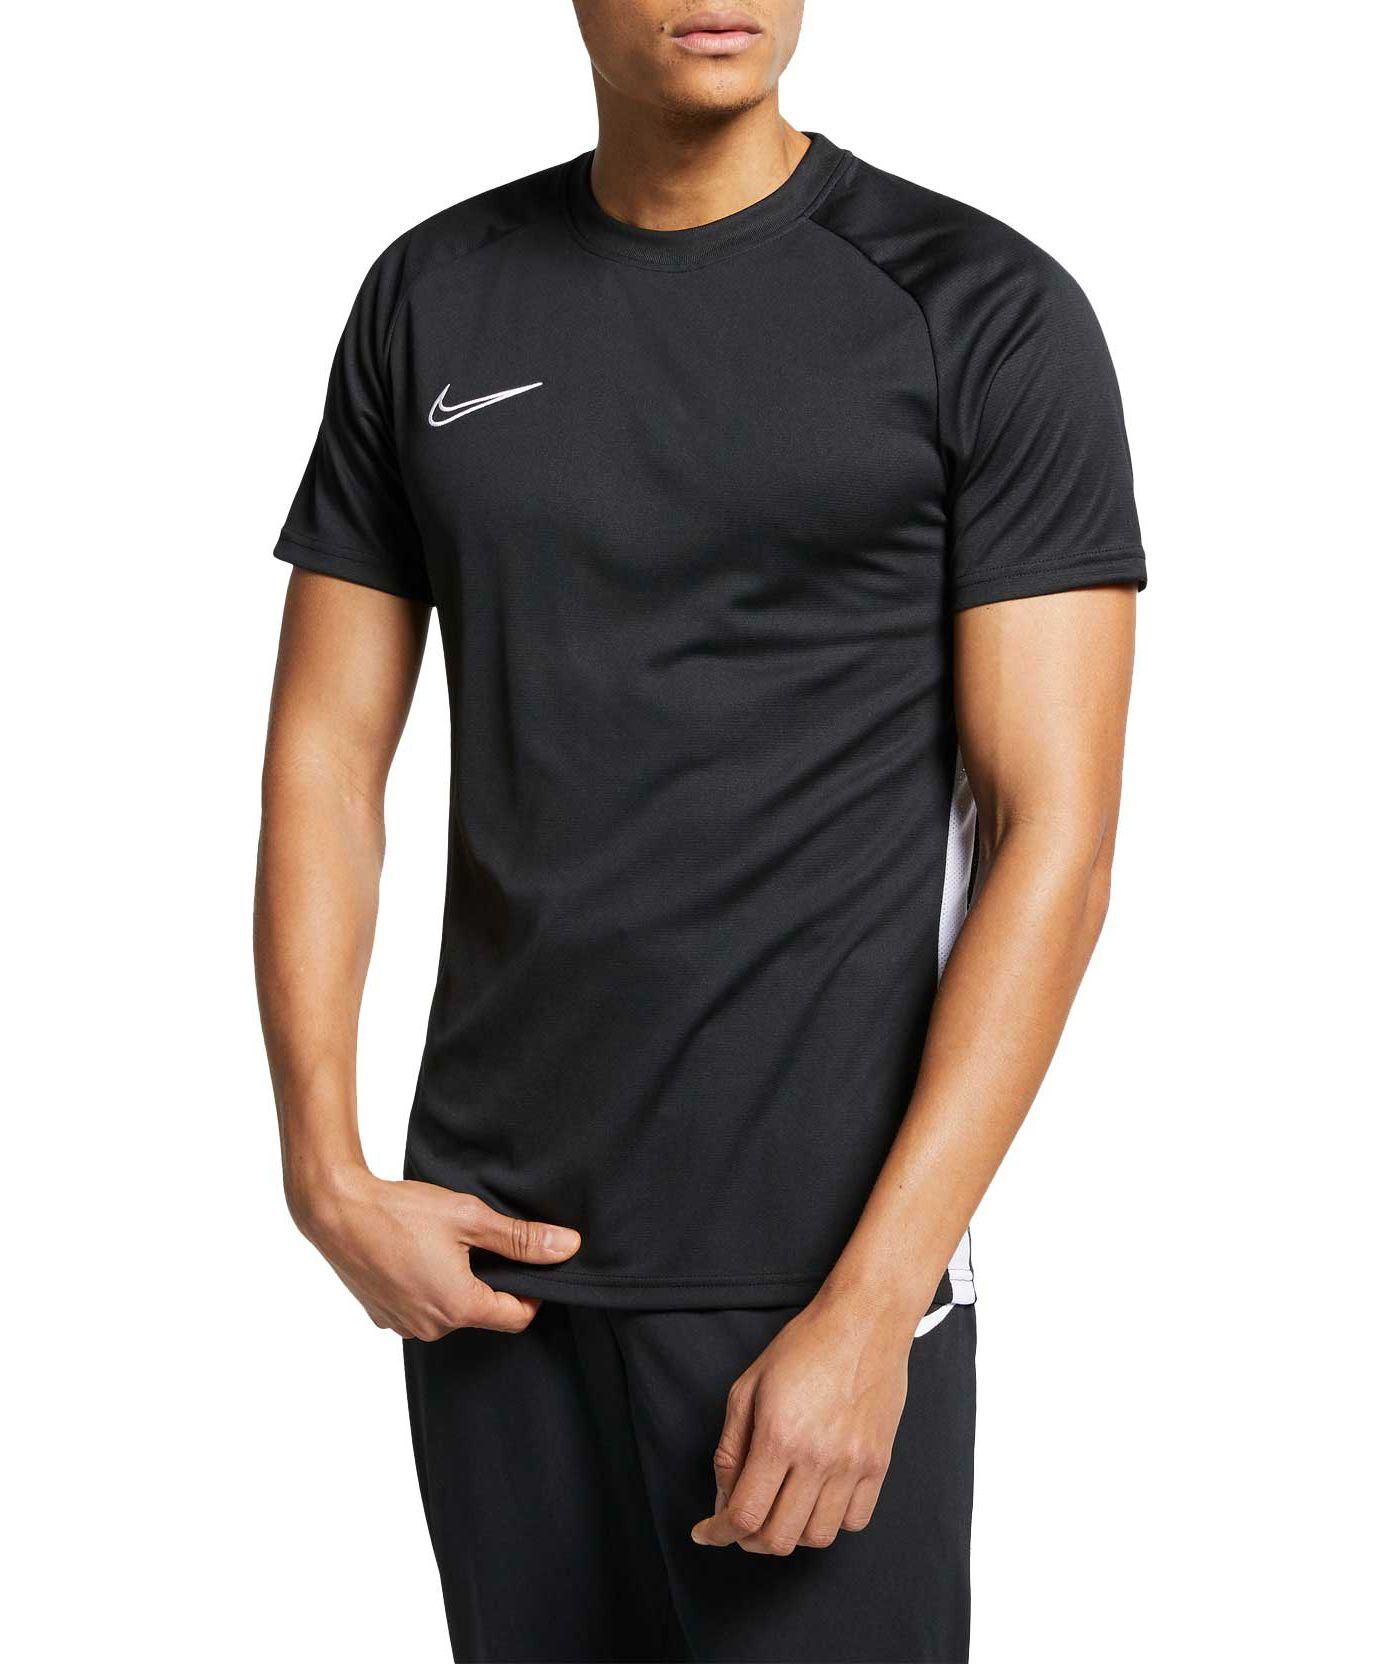 Nike Men's Dry Academy Soccer Tee